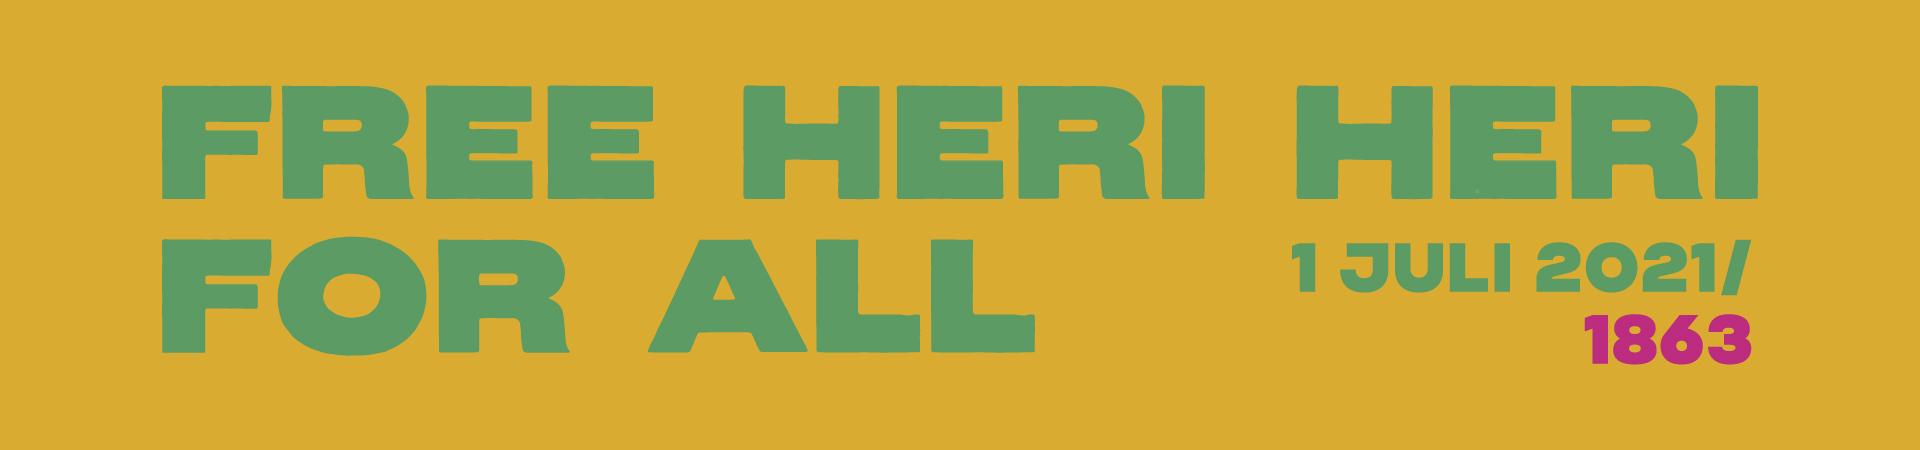 Free Heri Heri tickets